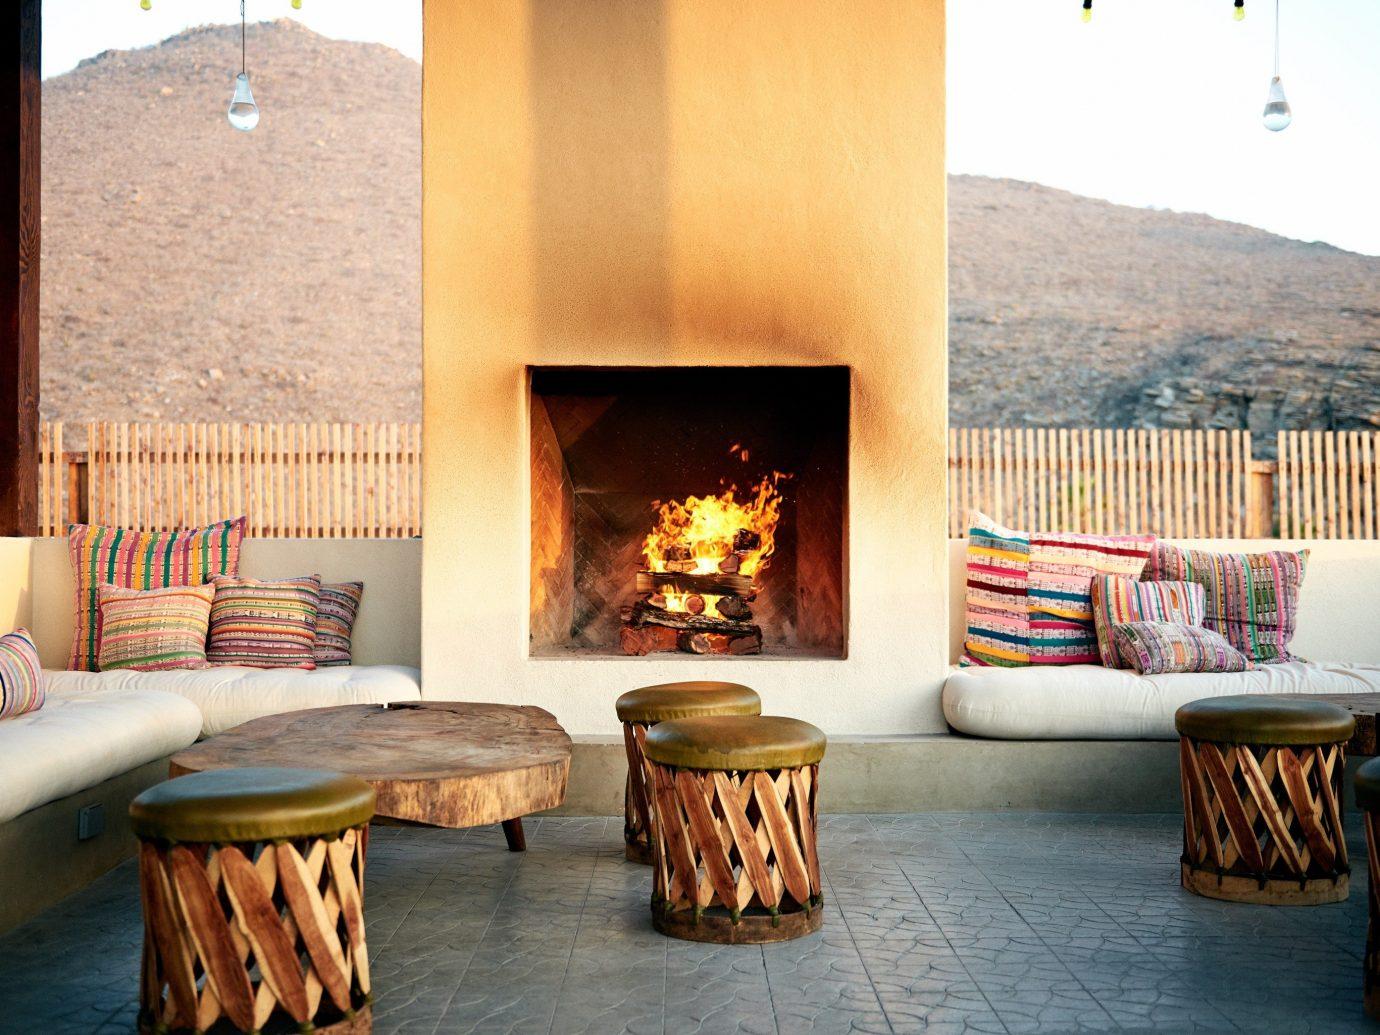 Beach Honeymoon Hotels Mexico Romance Tulum Living indoor floor hearth room living room interior design Fireplace furniture table wood burning stove real estate wood stone